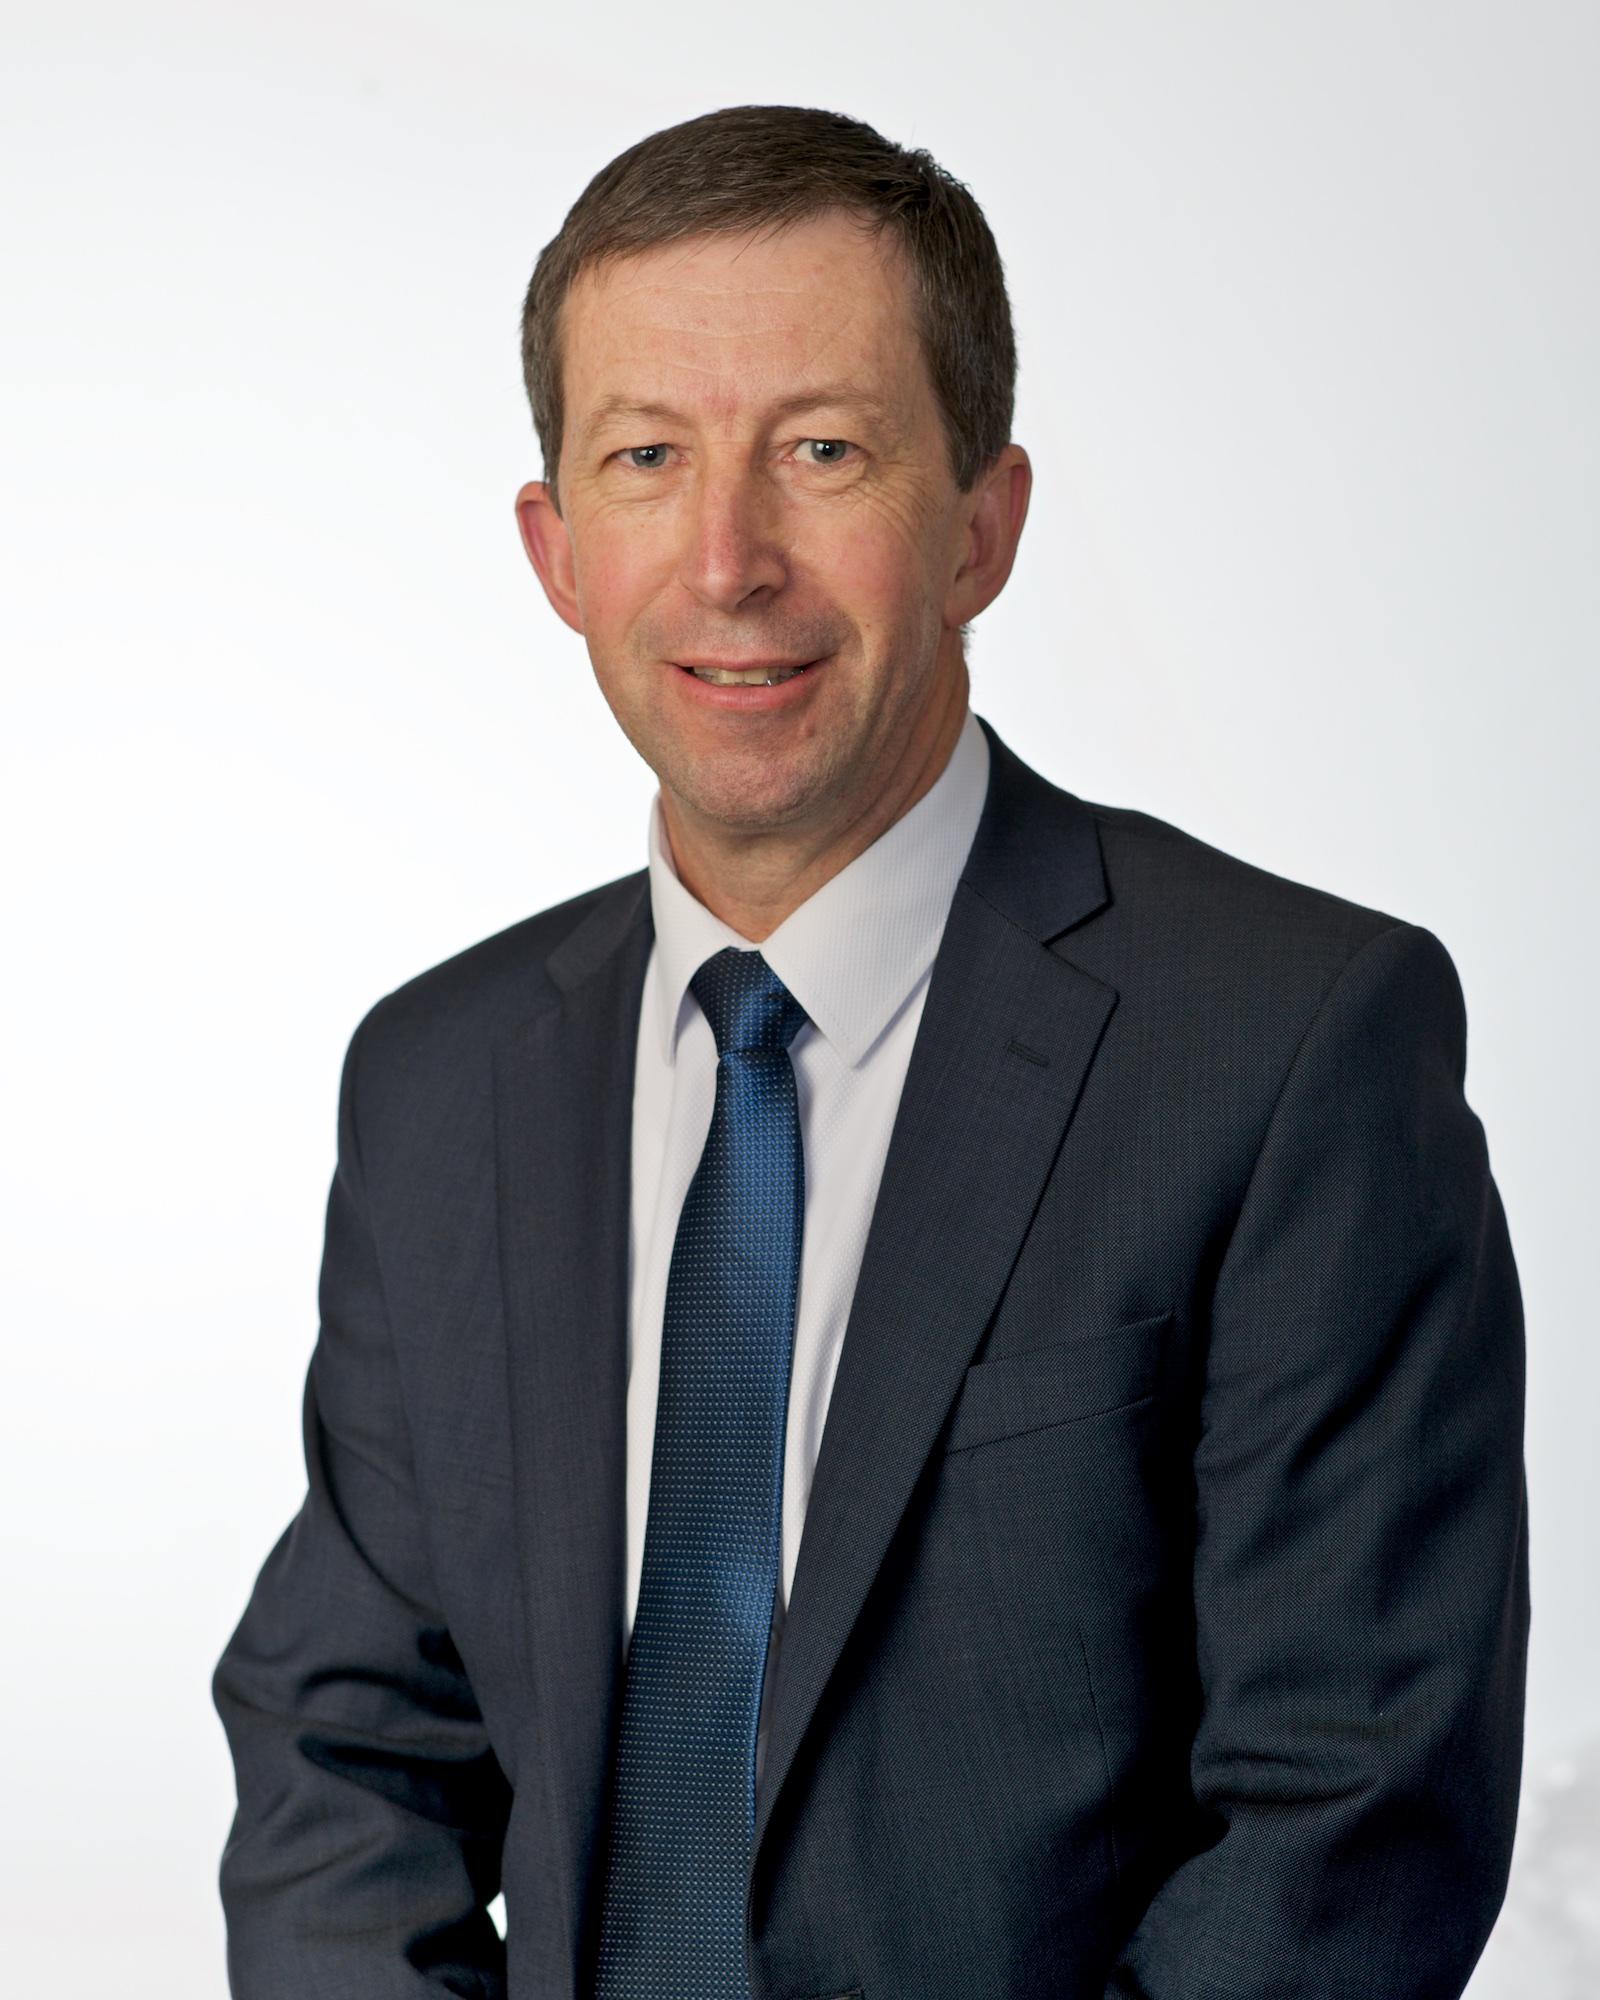 Mr Ian Hewitt